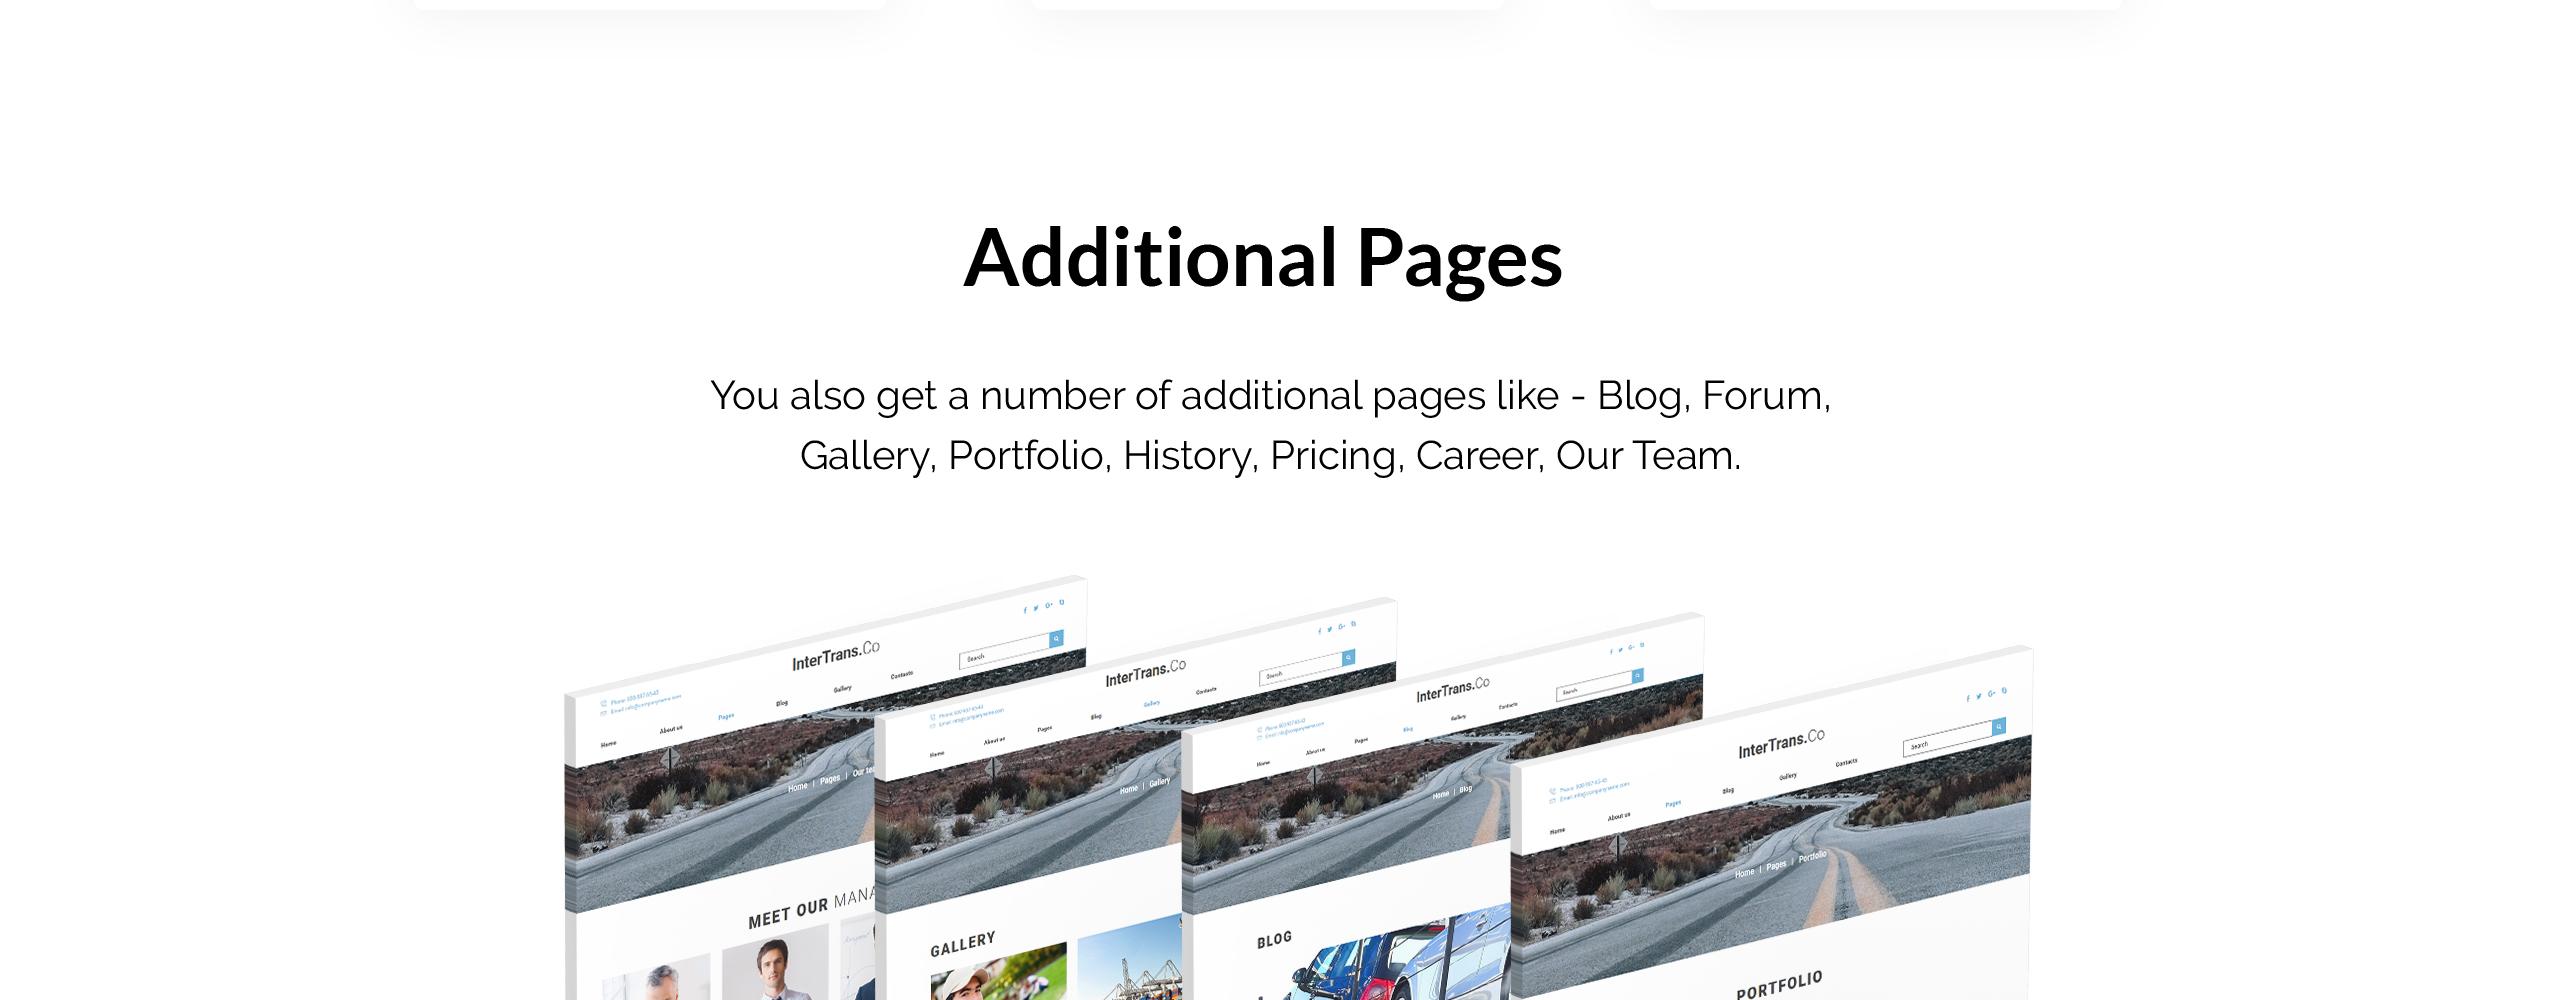 Website Design Template 74418 - company joomla logistics transportationundefined